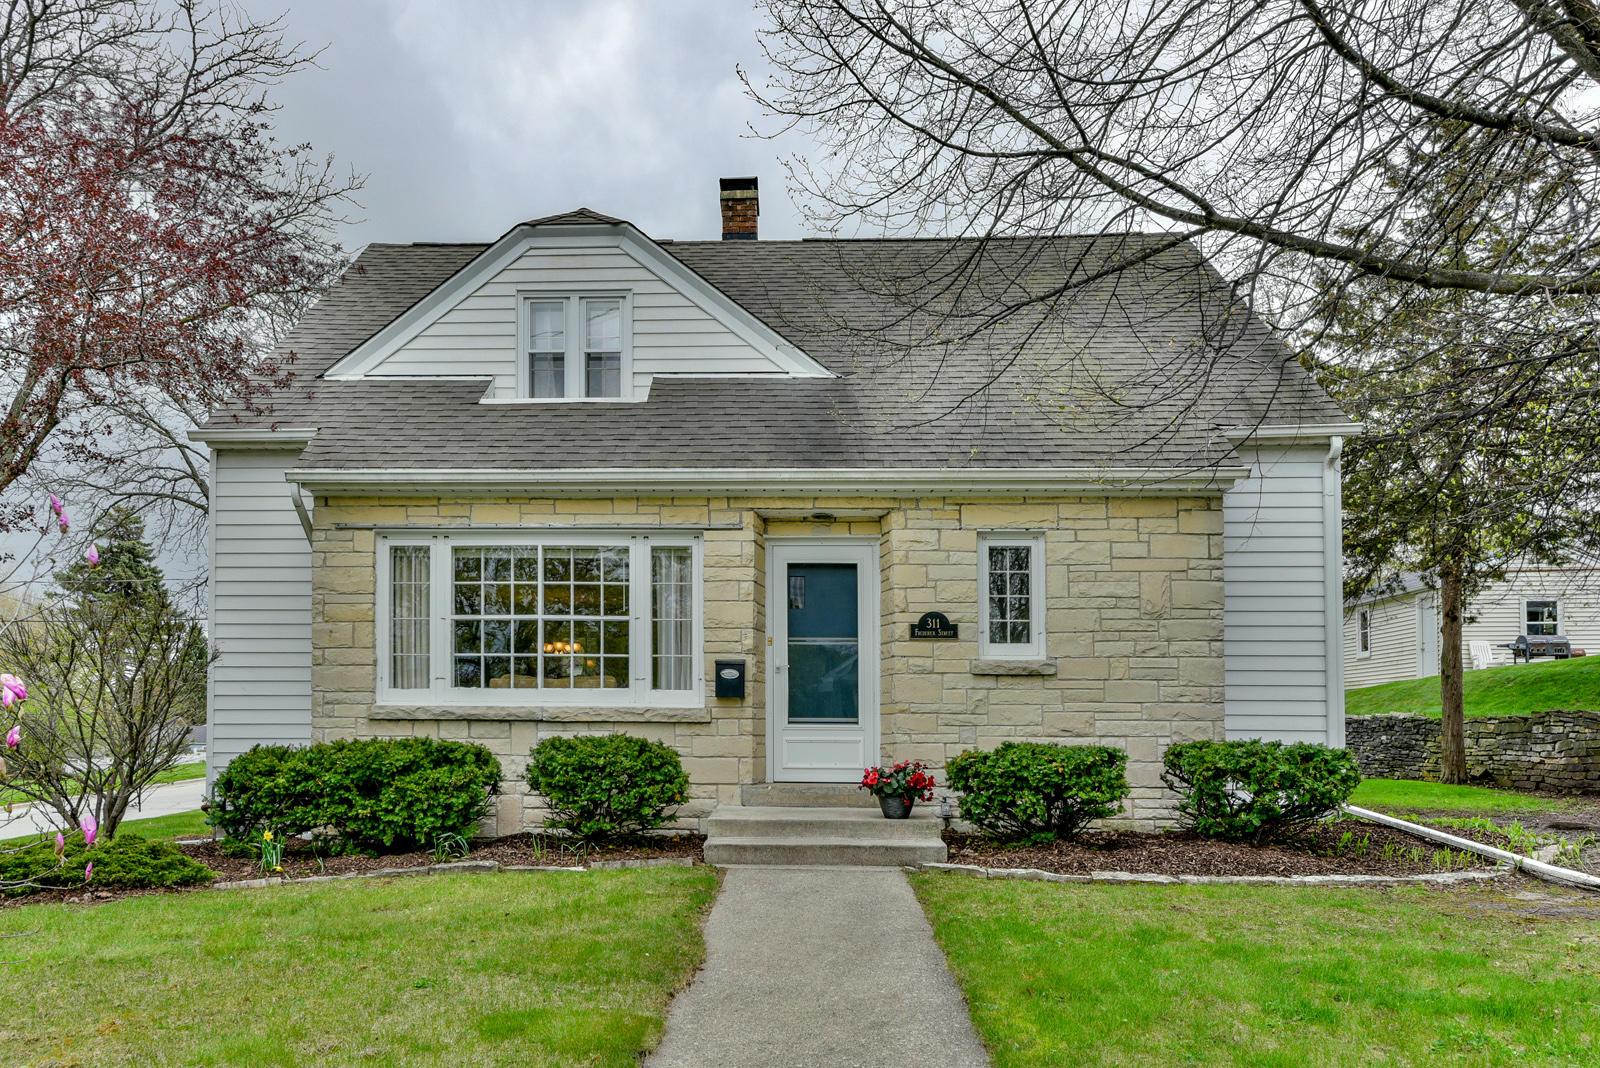 311 Frederick St, Waukesha, Wisconsin 53186, 3 Bedrooms Bedrooms, 8 Rooms Rooms,1 BathroomBathrooms,Single-Family,For Sale,Frederick St,1636304